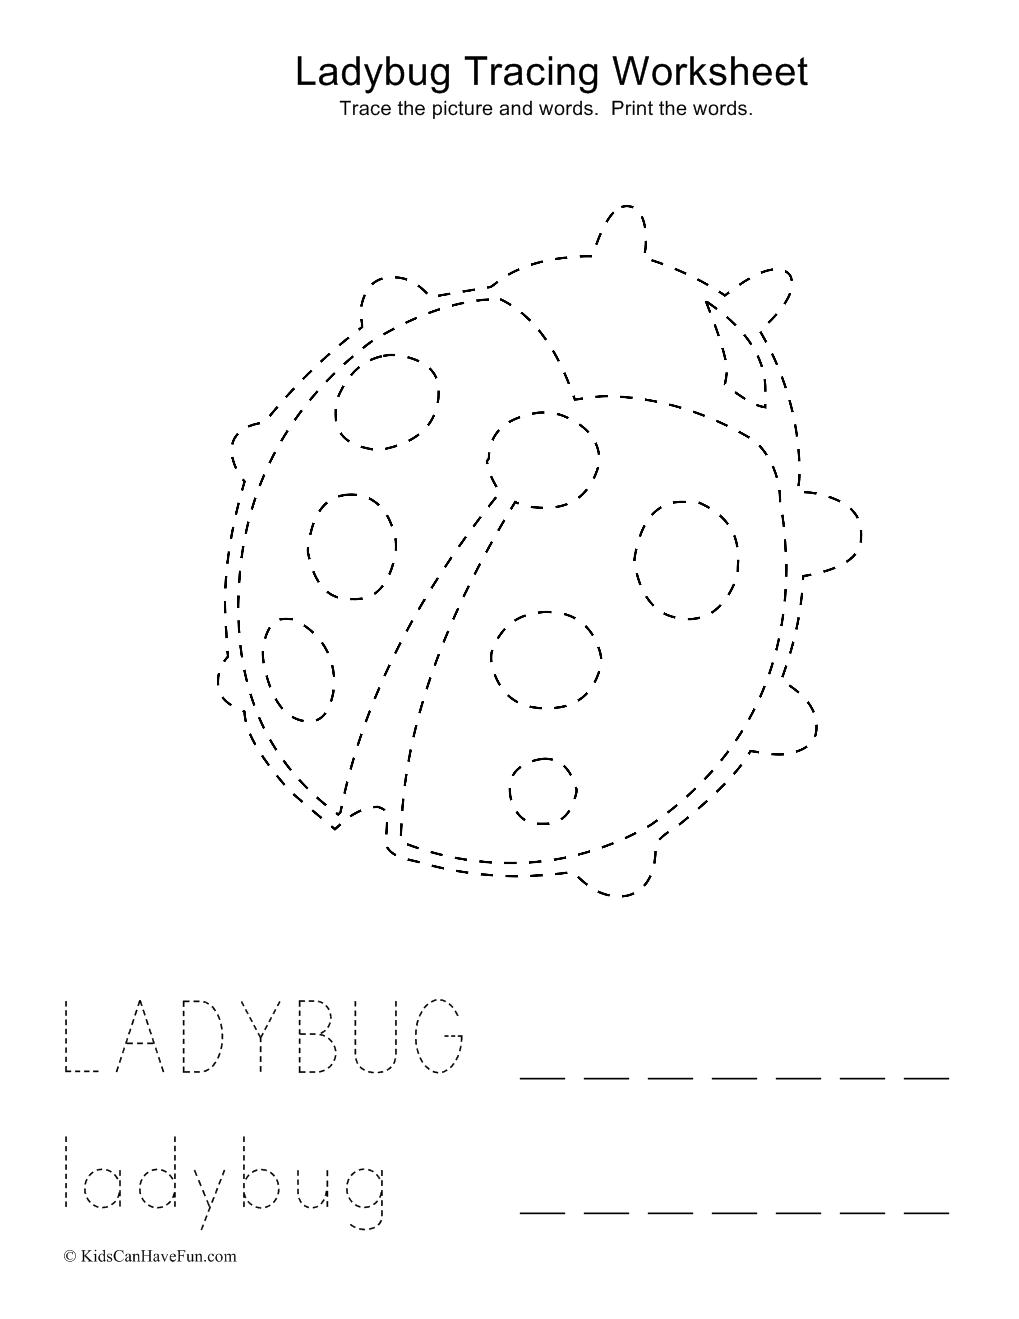 Tracing Ladybug Picture And Words Worksheet Ladybugs Preschool Printable Preschool Worksheets Insects Preschool [ 1319 x 1019 Pixel ]